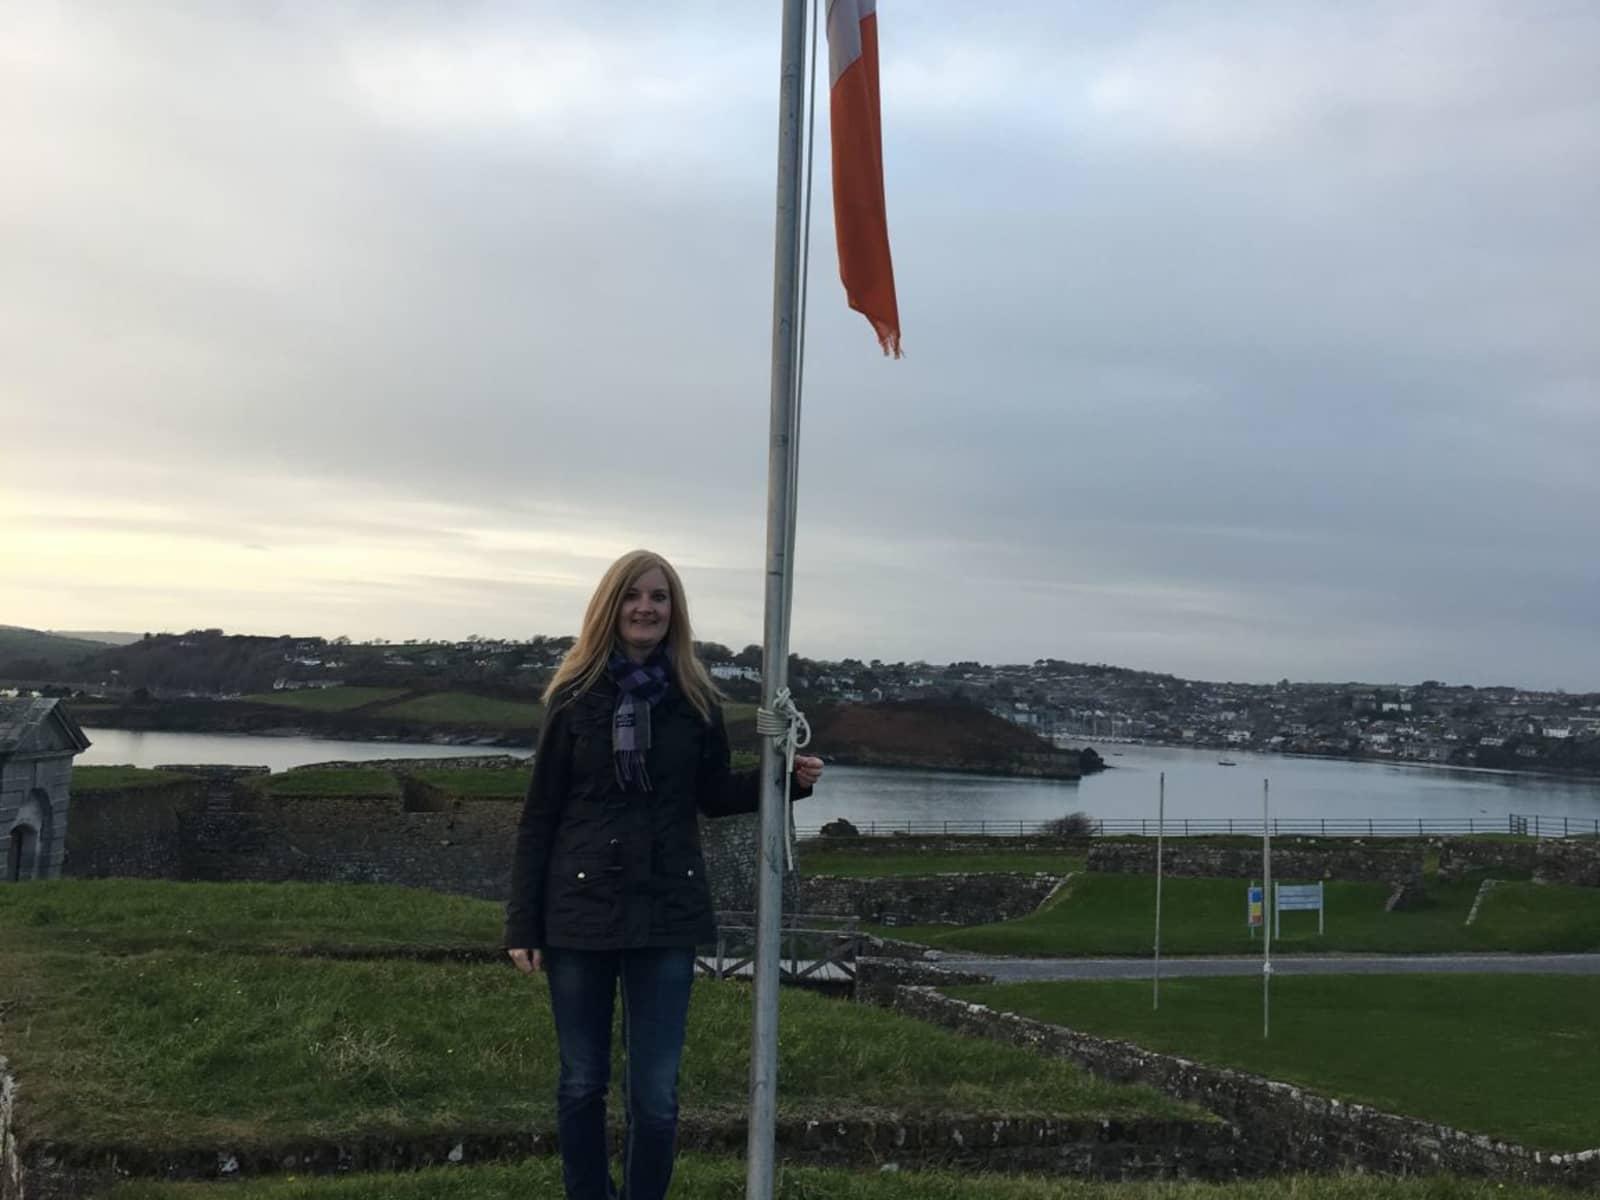 Tara from Cork, Ireland